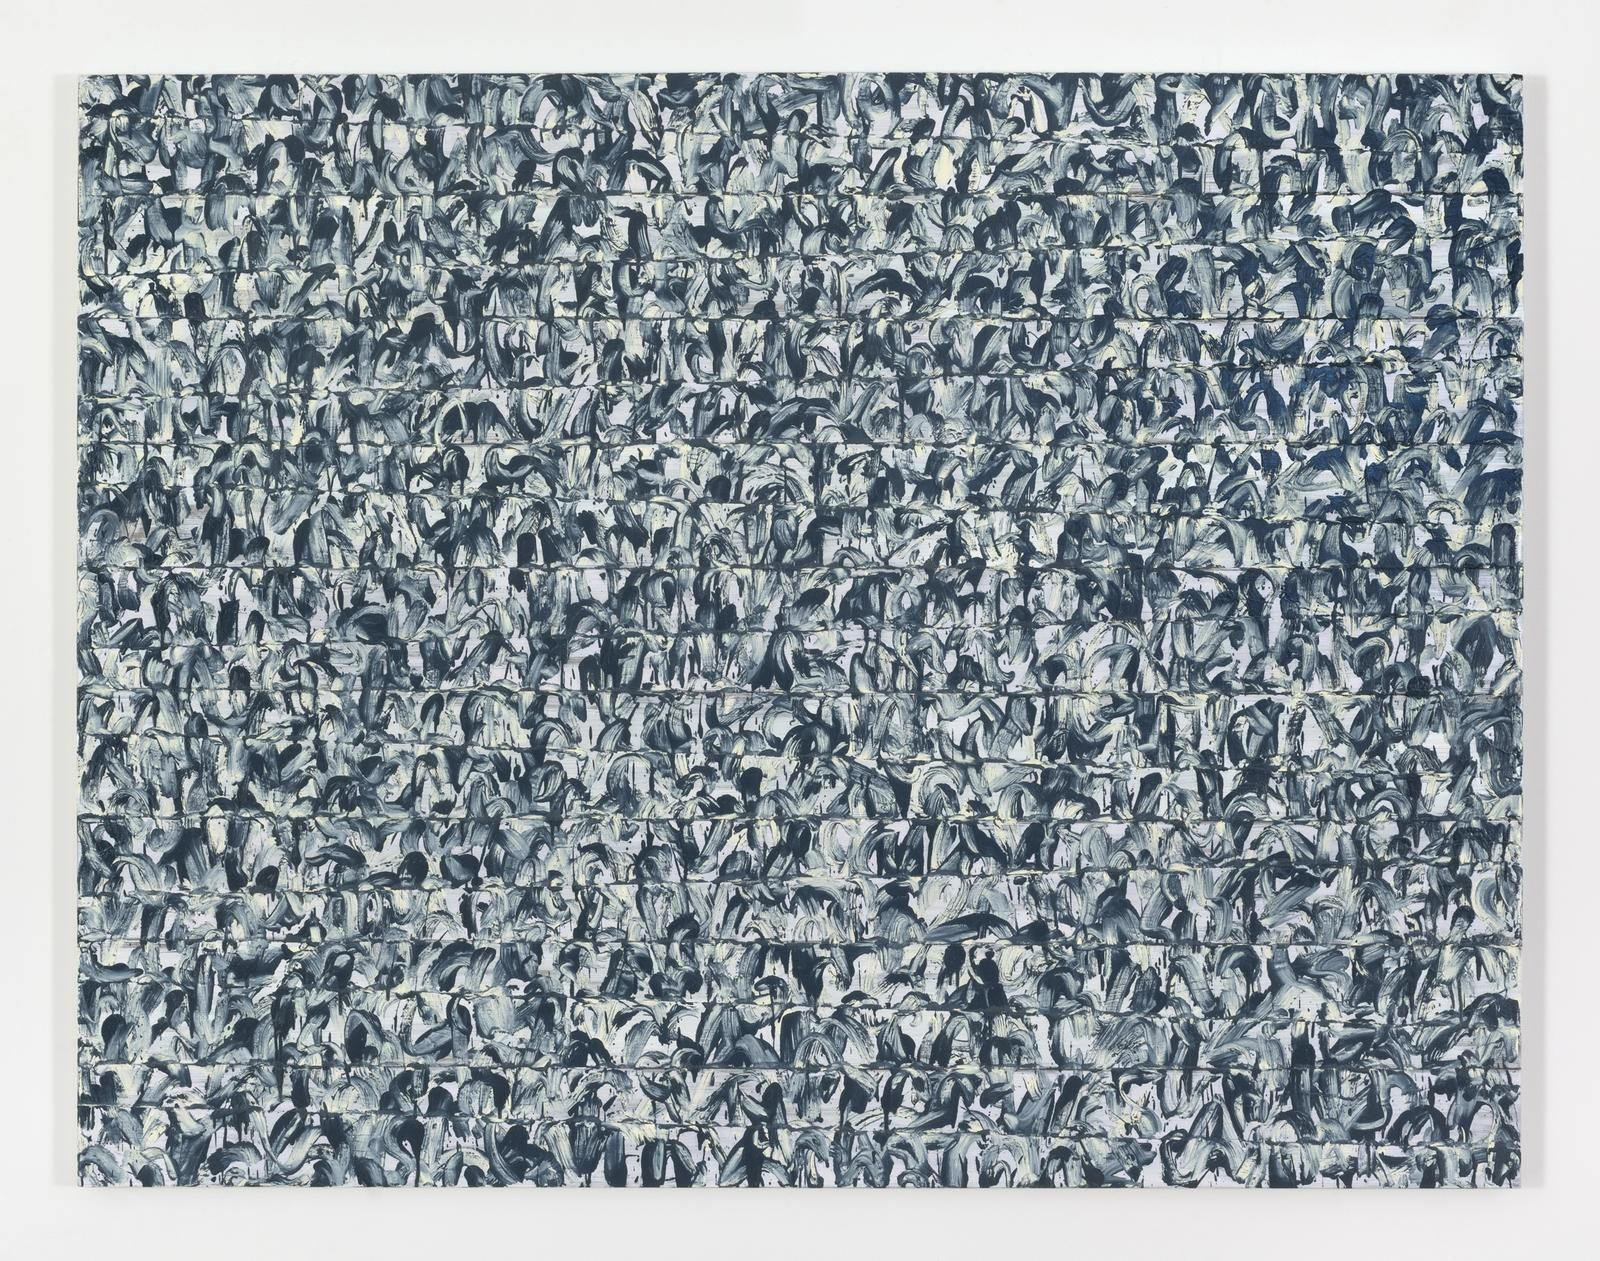 Julian Lethbridge Untitled, 2012